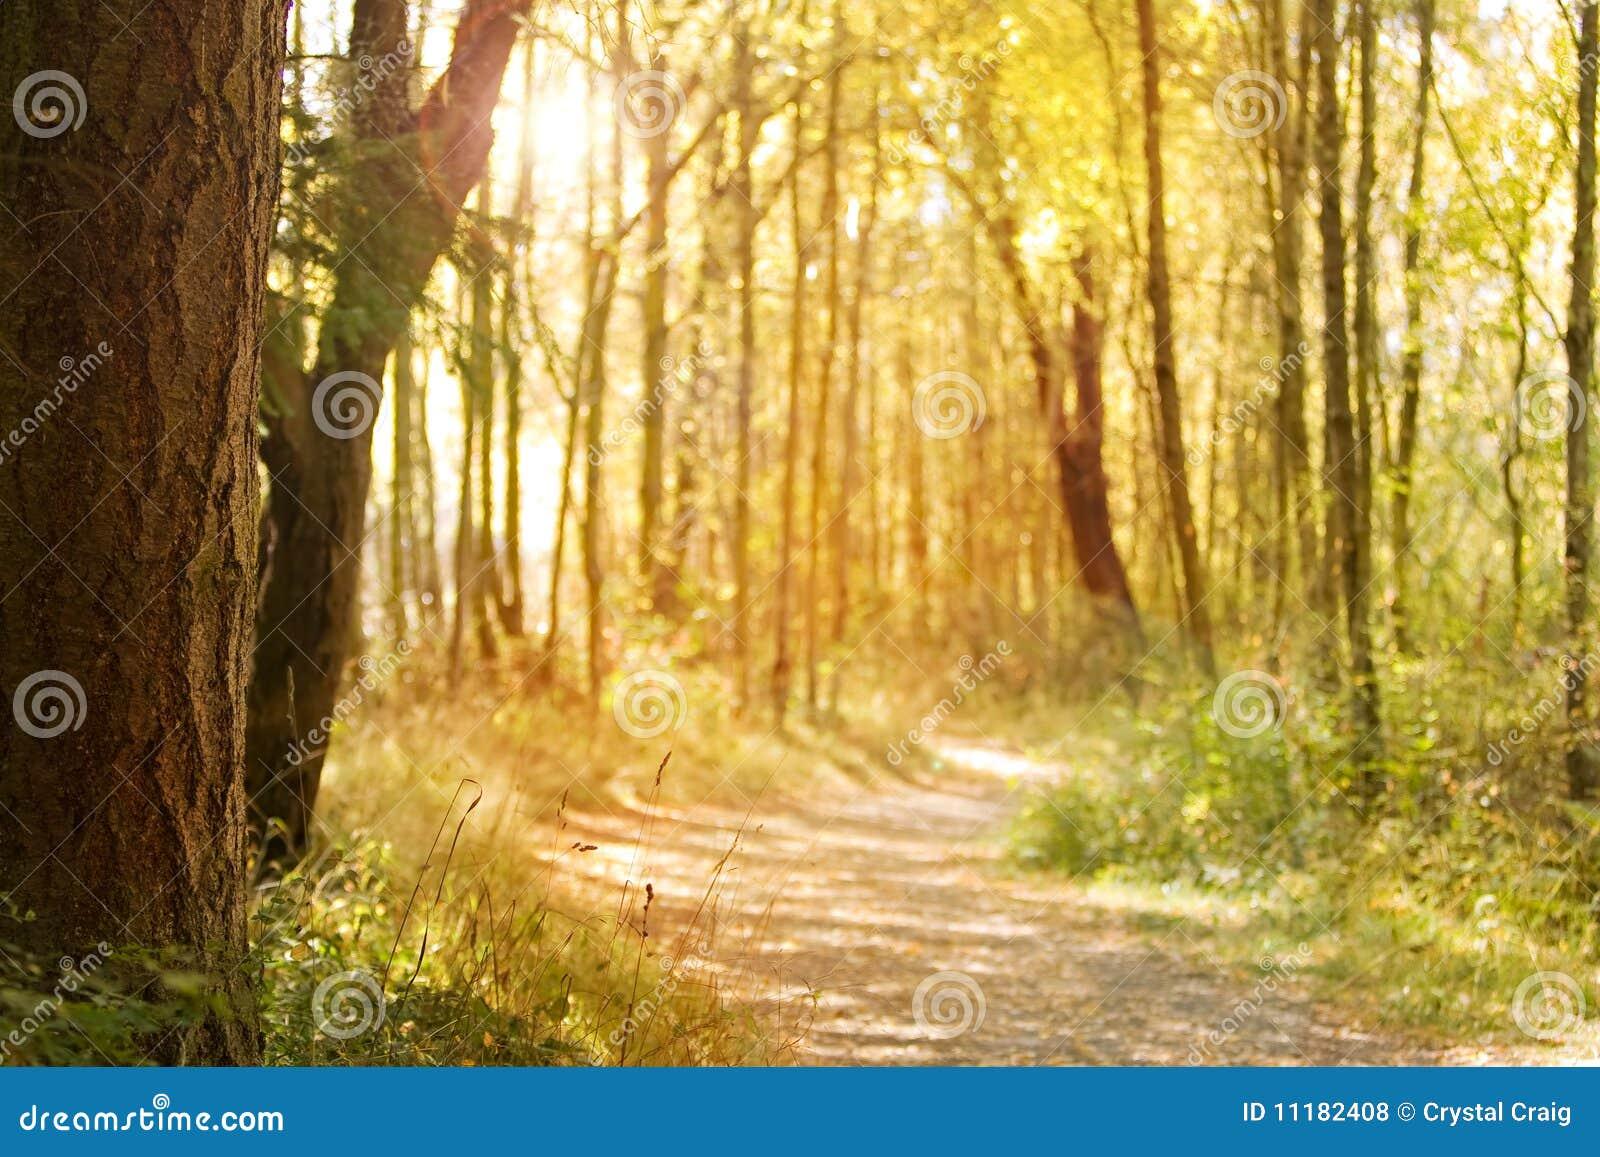 Download Sunlit nature path stock photo. Image of yellow, sunshine - 11182408